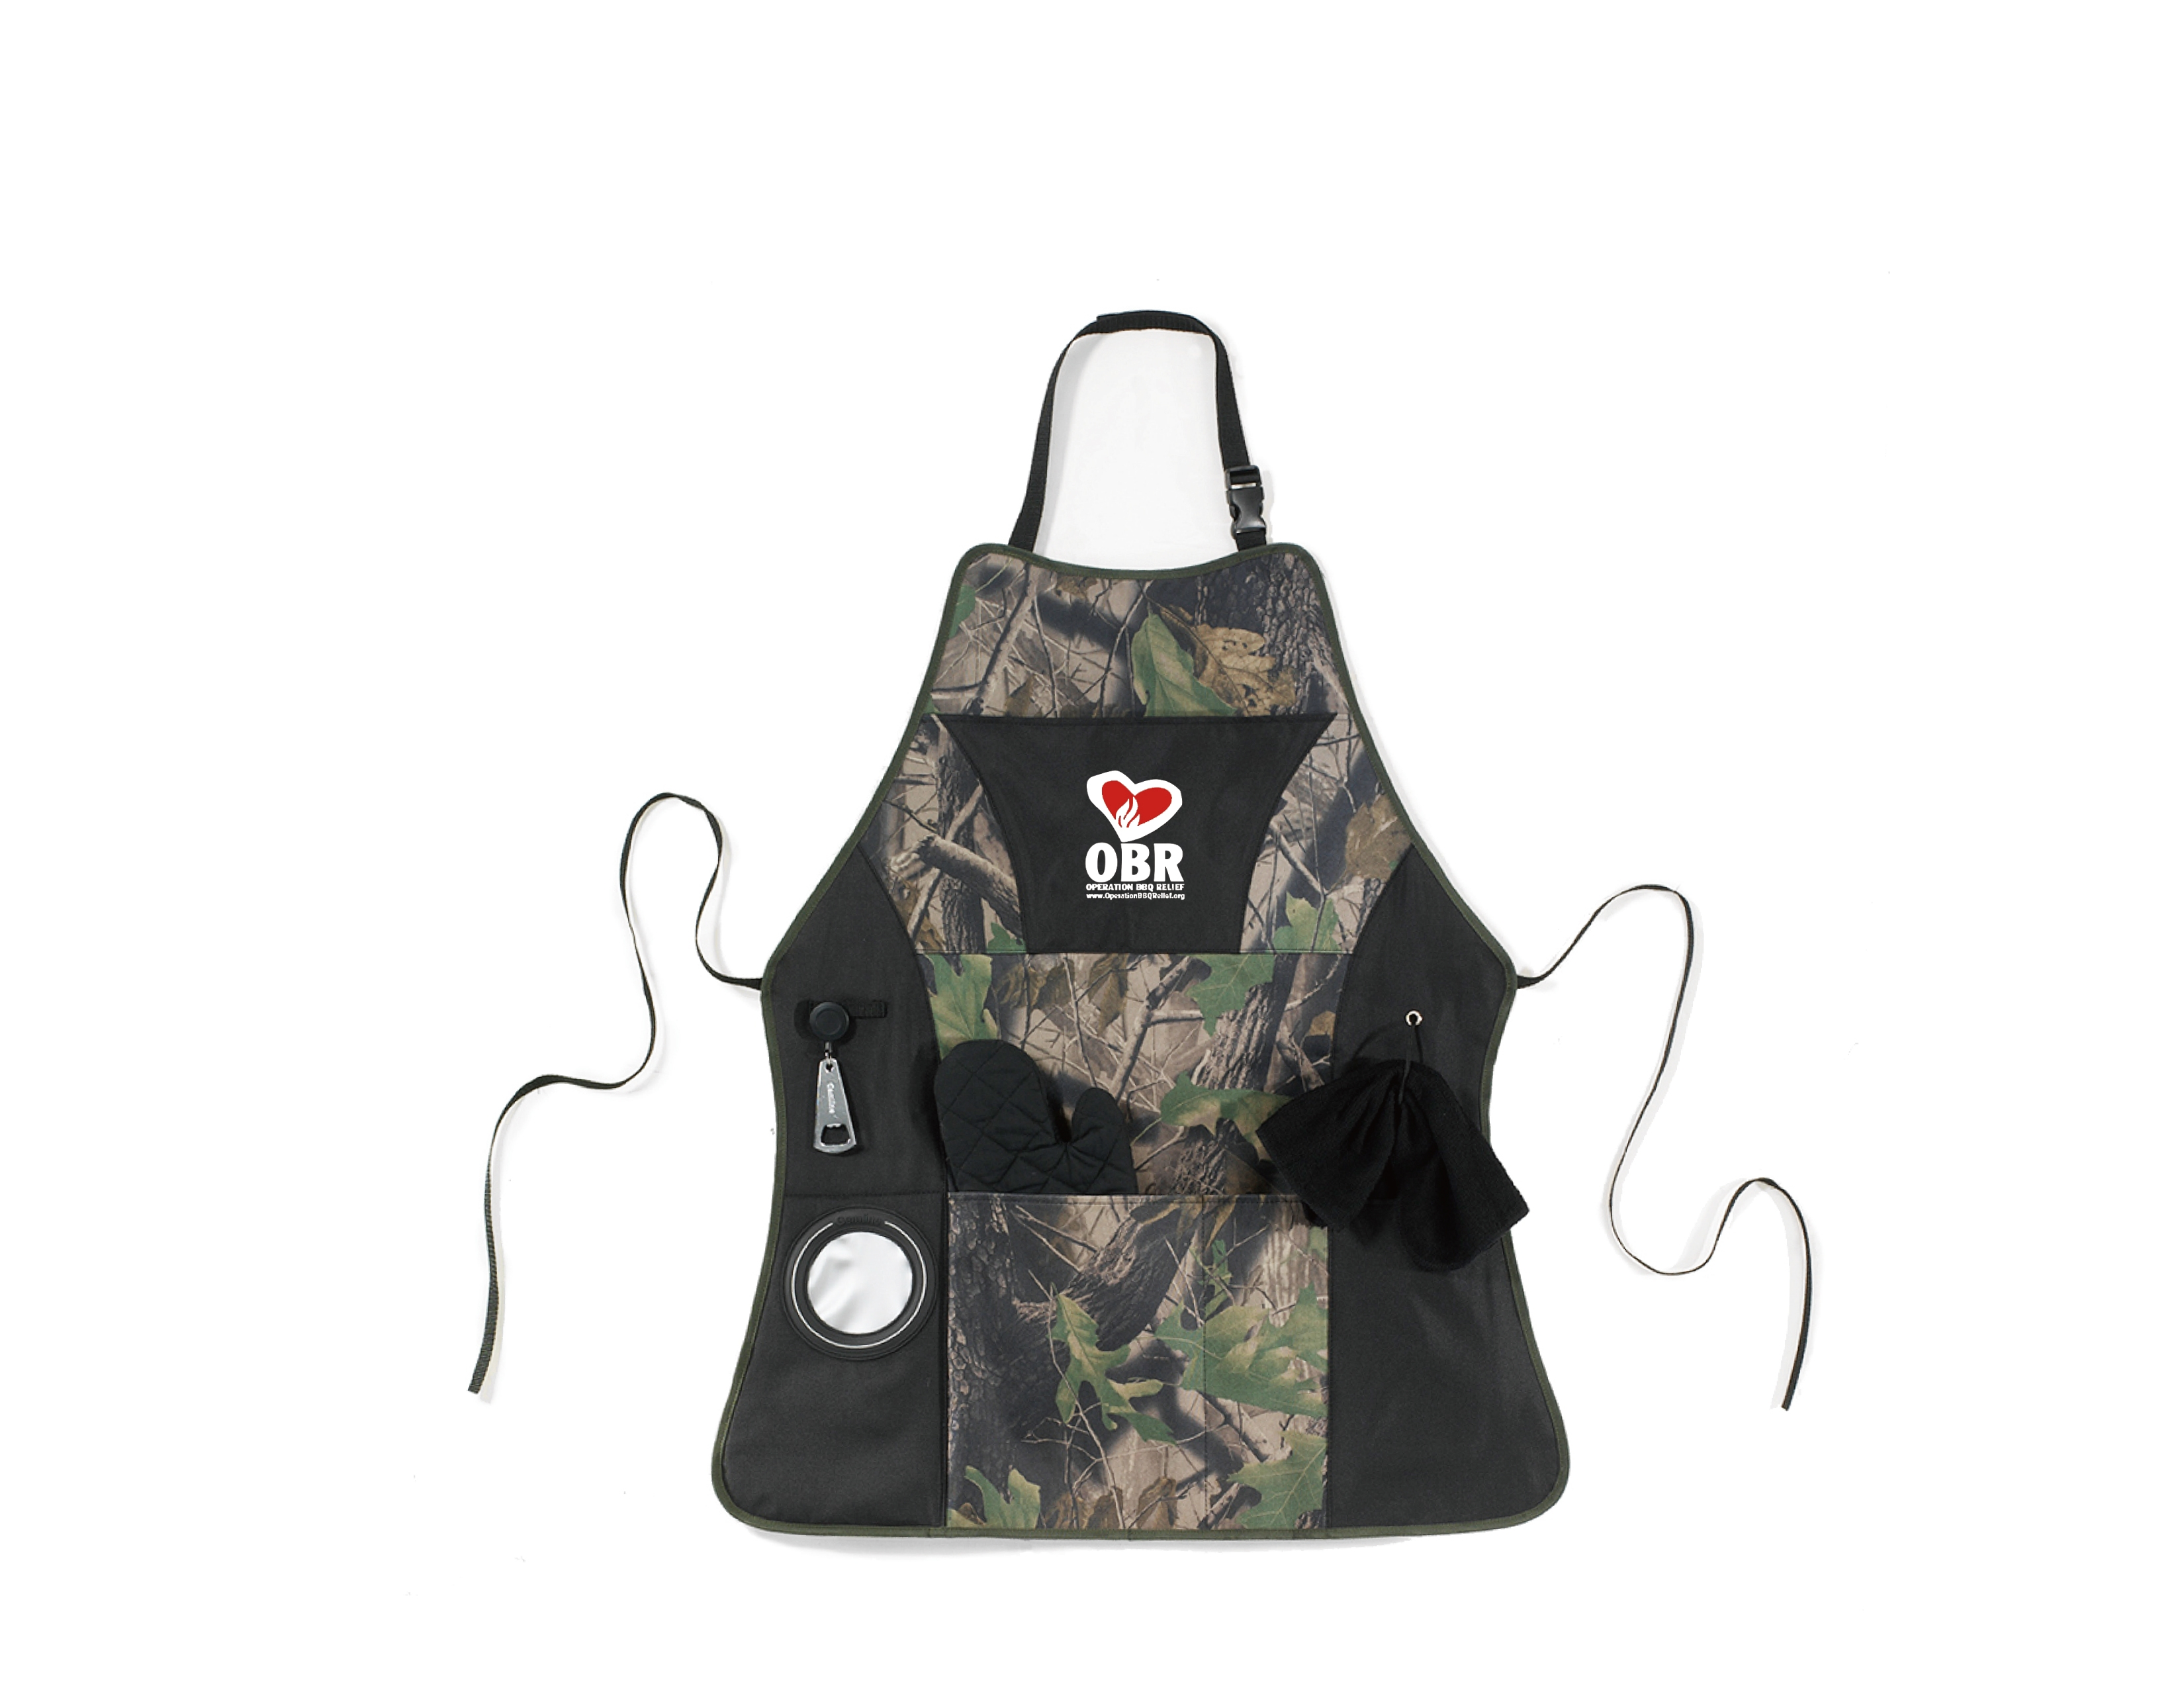 OBR Grill Master Apron Kit - Camo